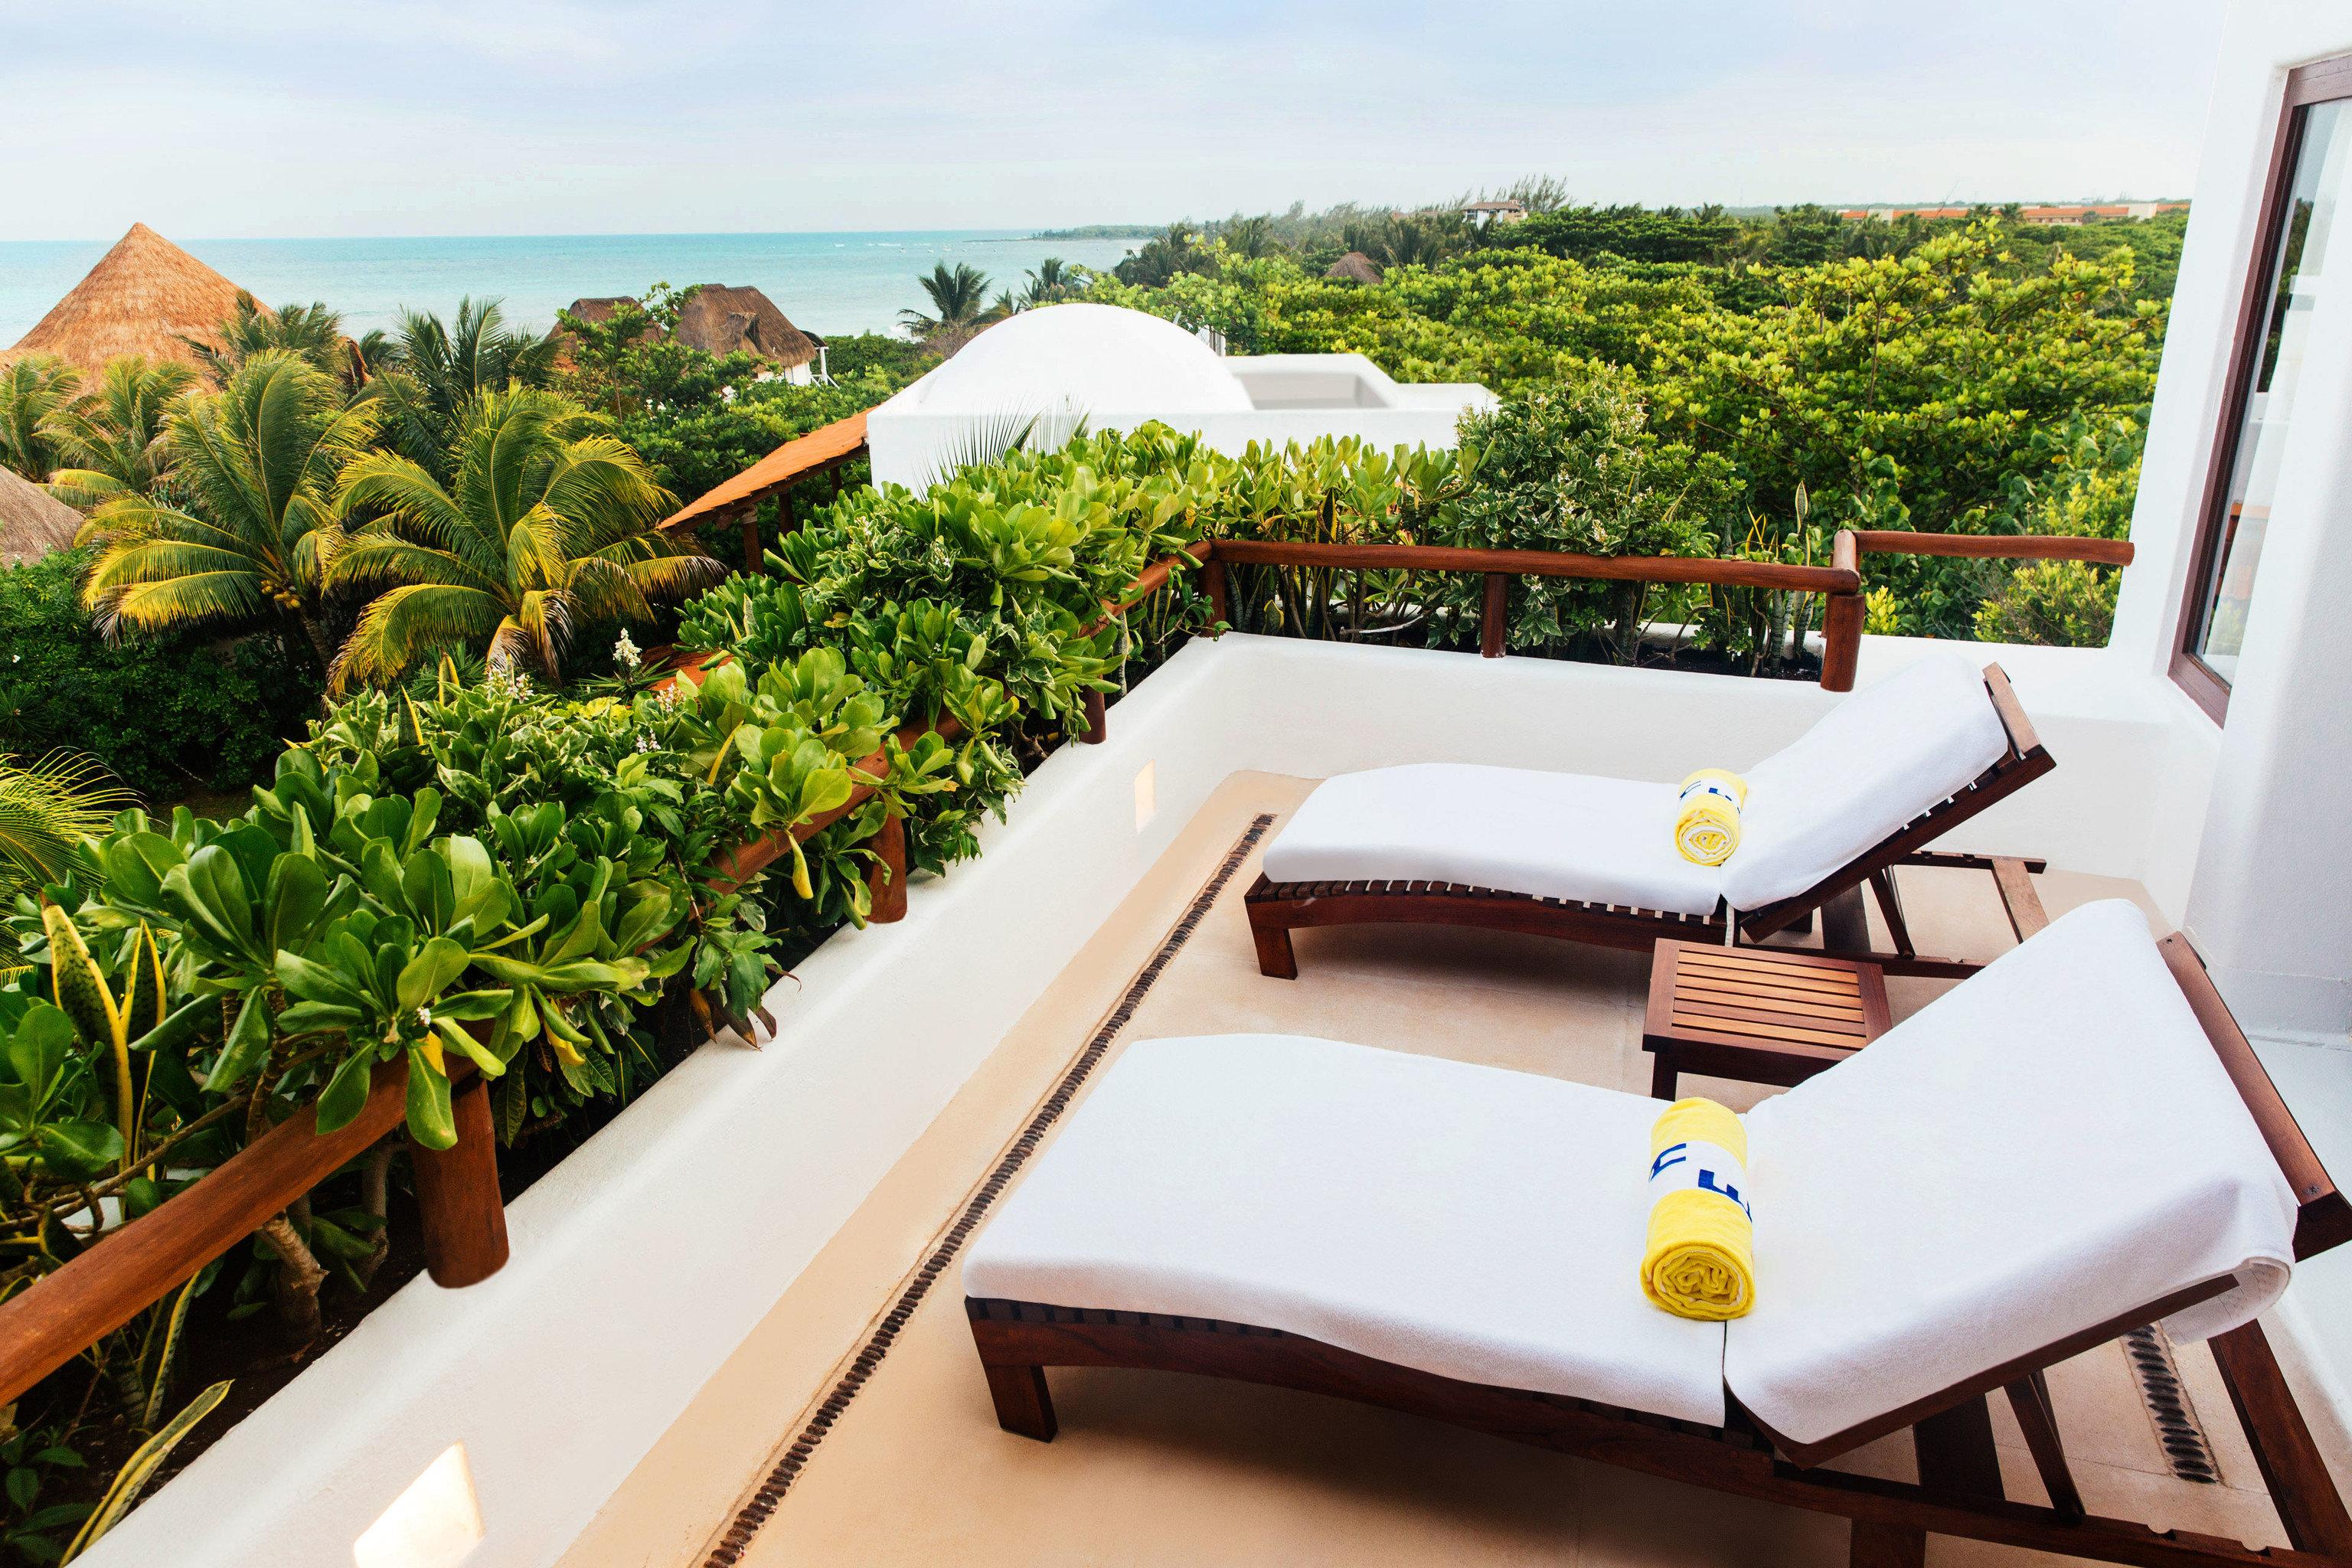 Hotels Romance sky leisure property Resort vacation Villa estate home swimming pool